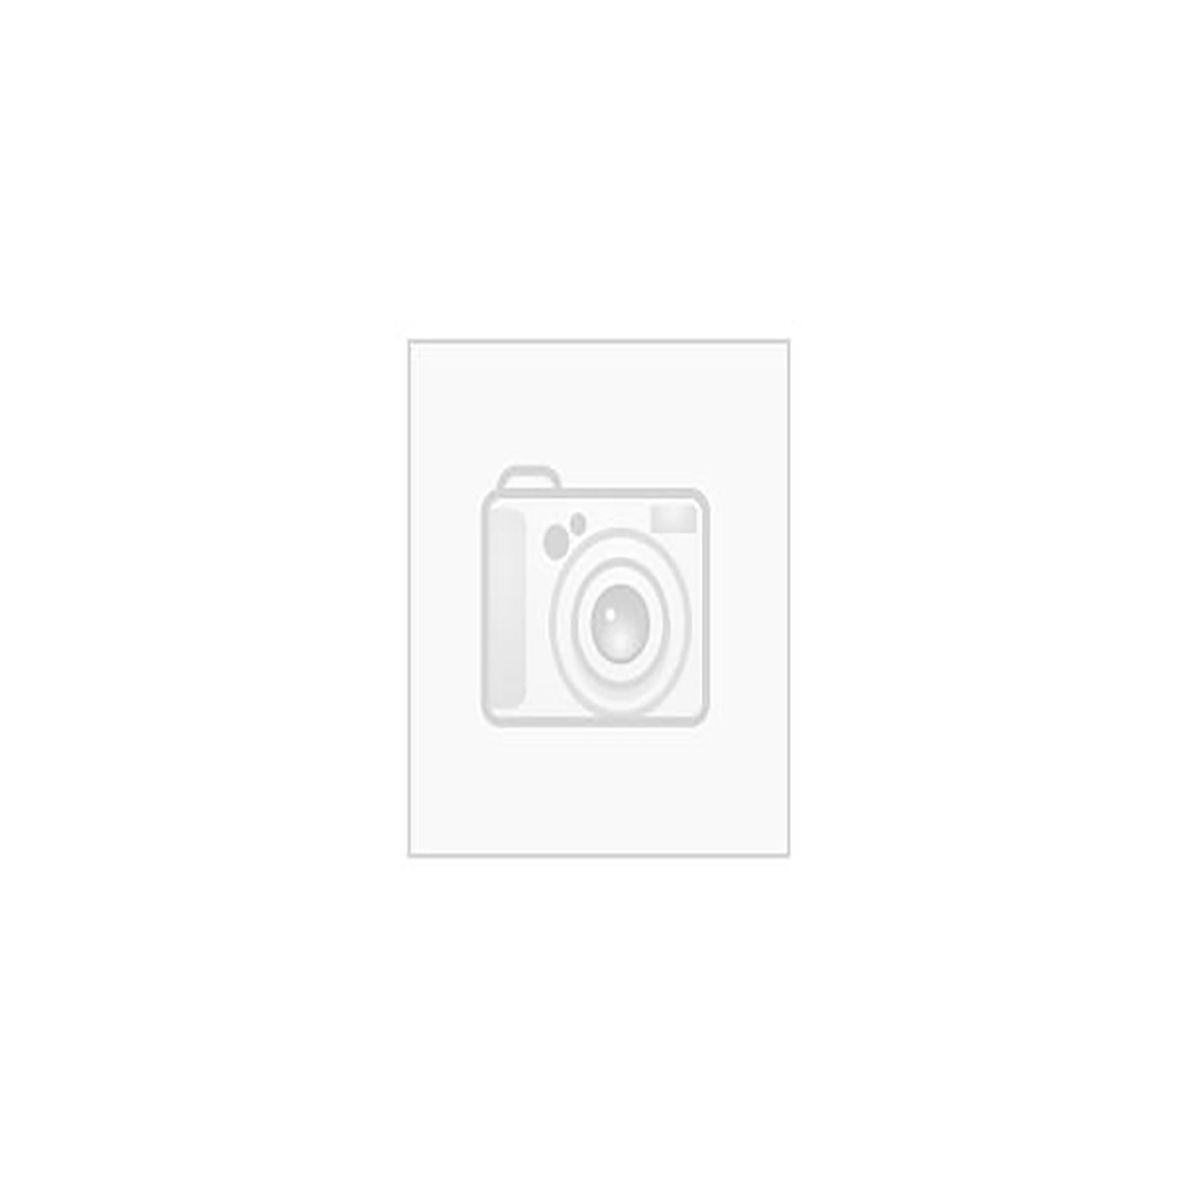 Sanipex Fordelerskap 2 x 12 uttak